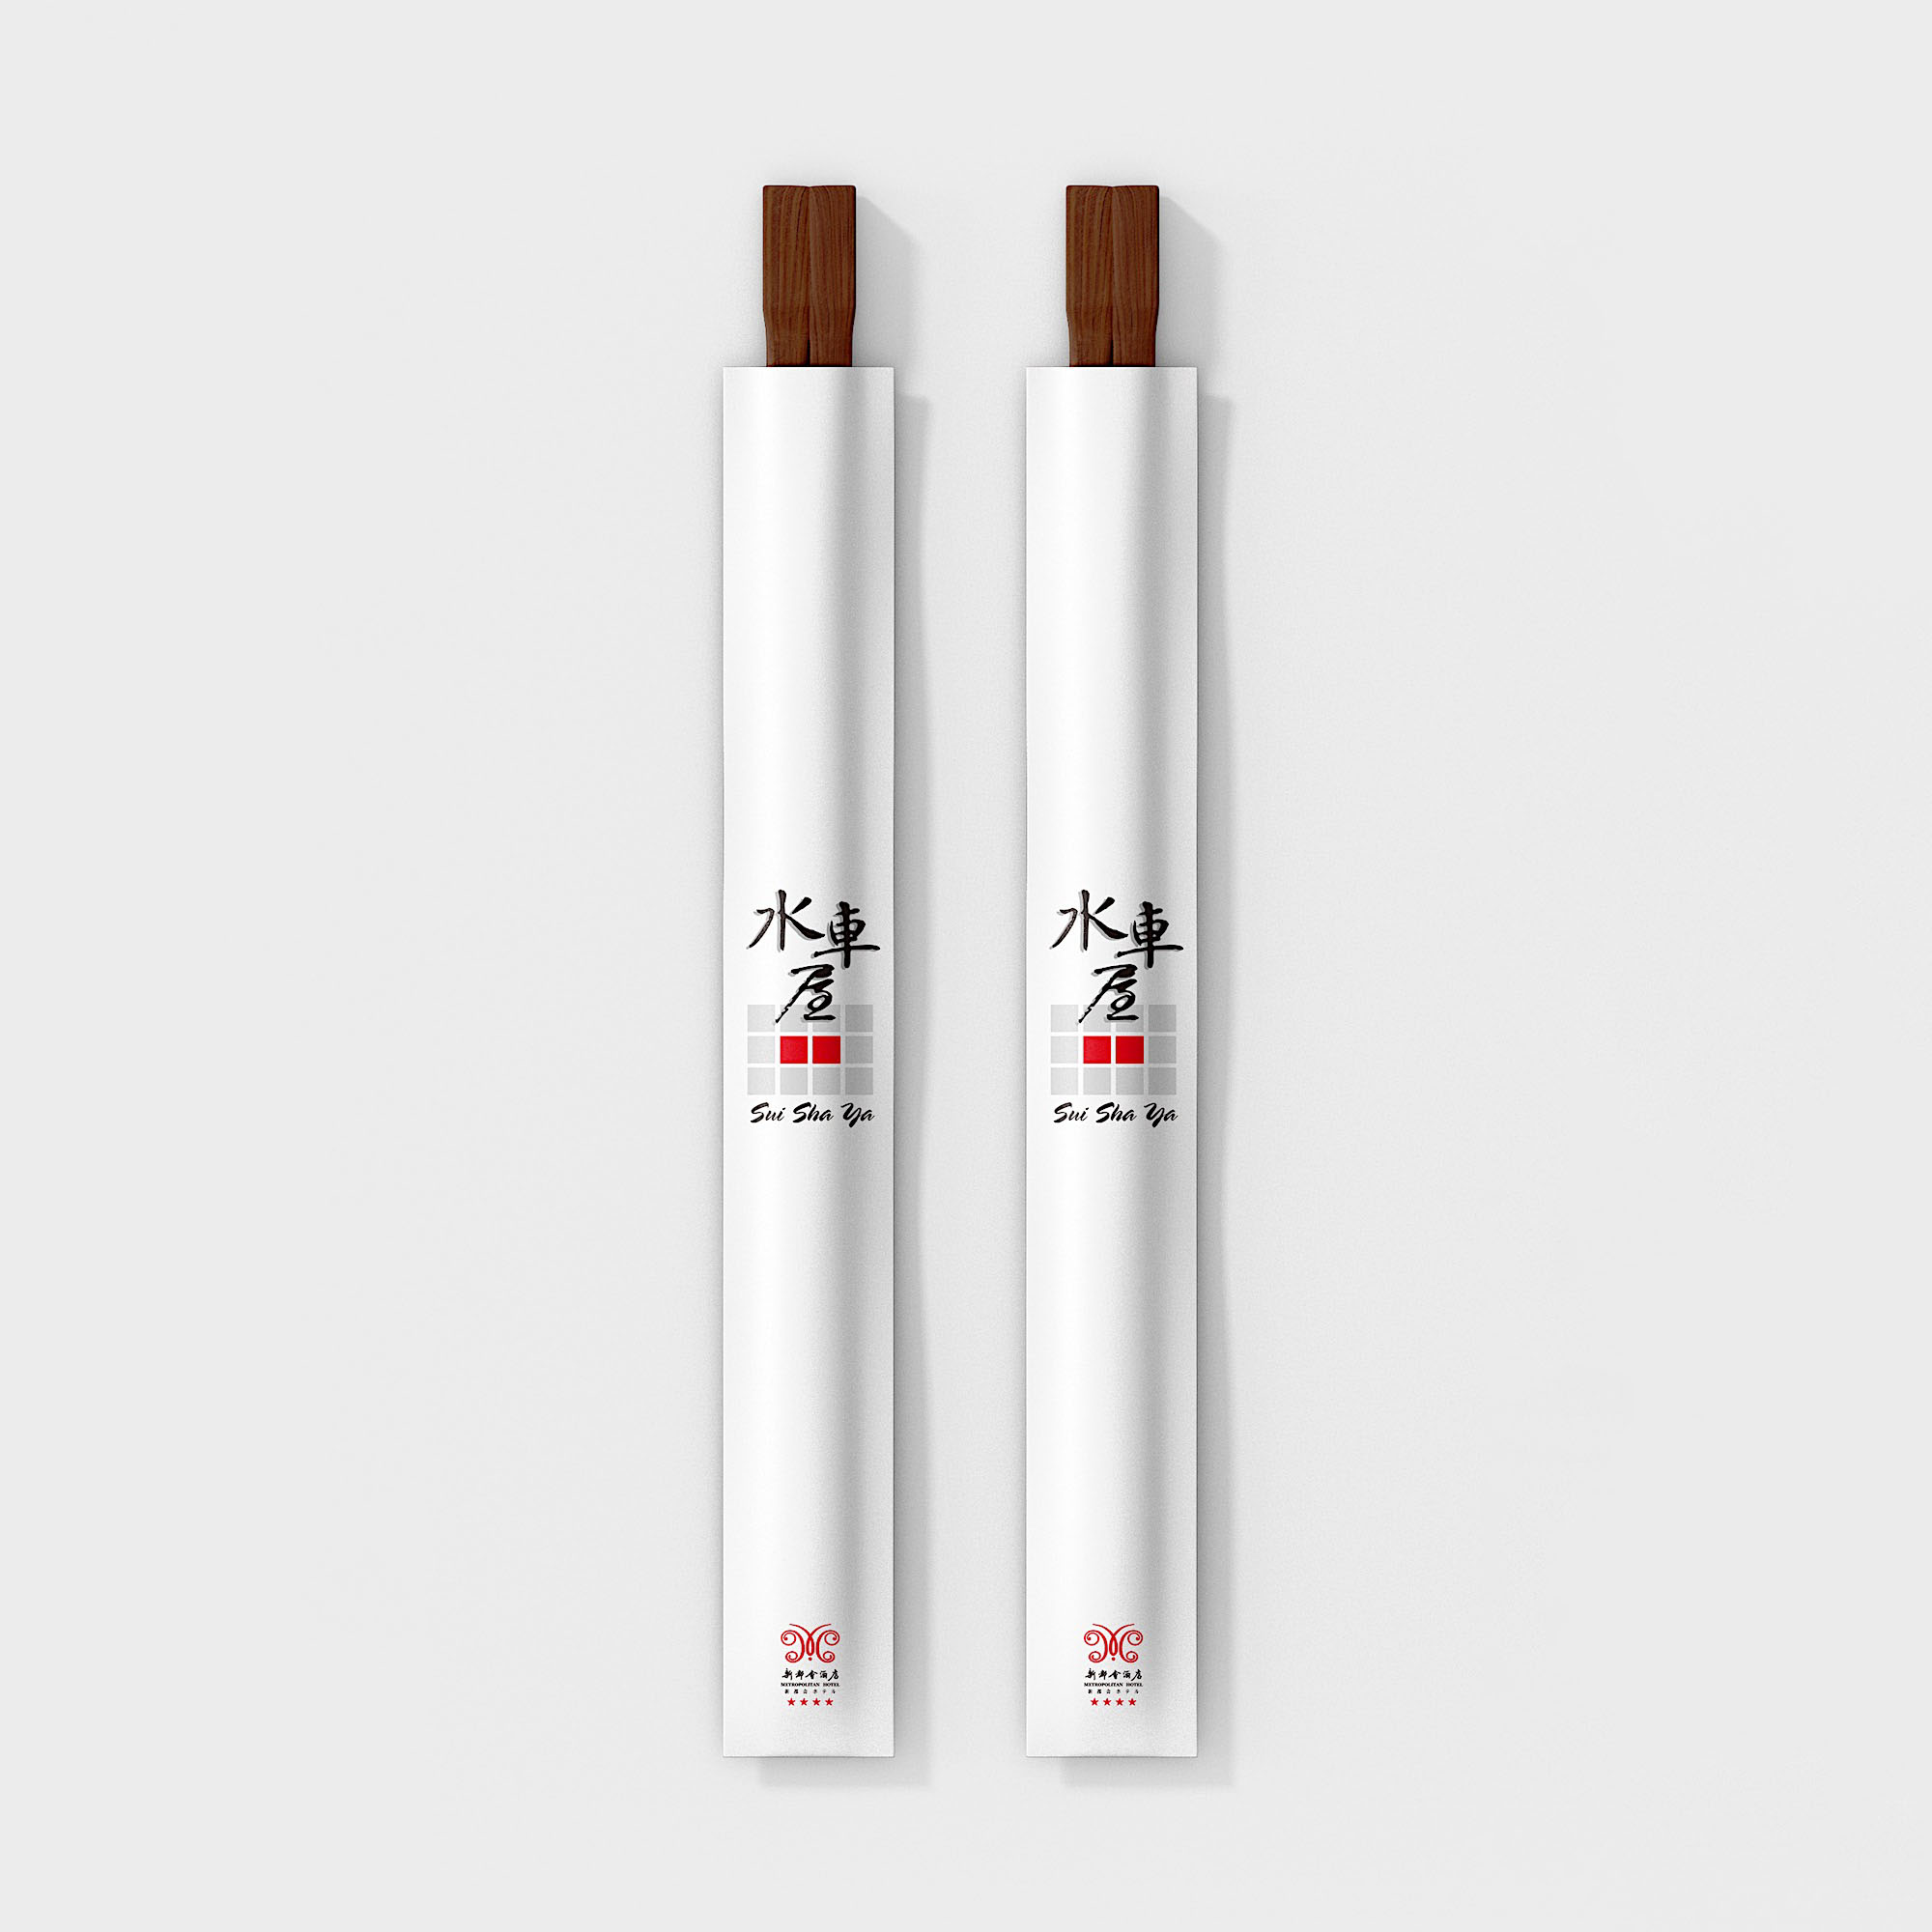 Suishaya Vi Chop Stick